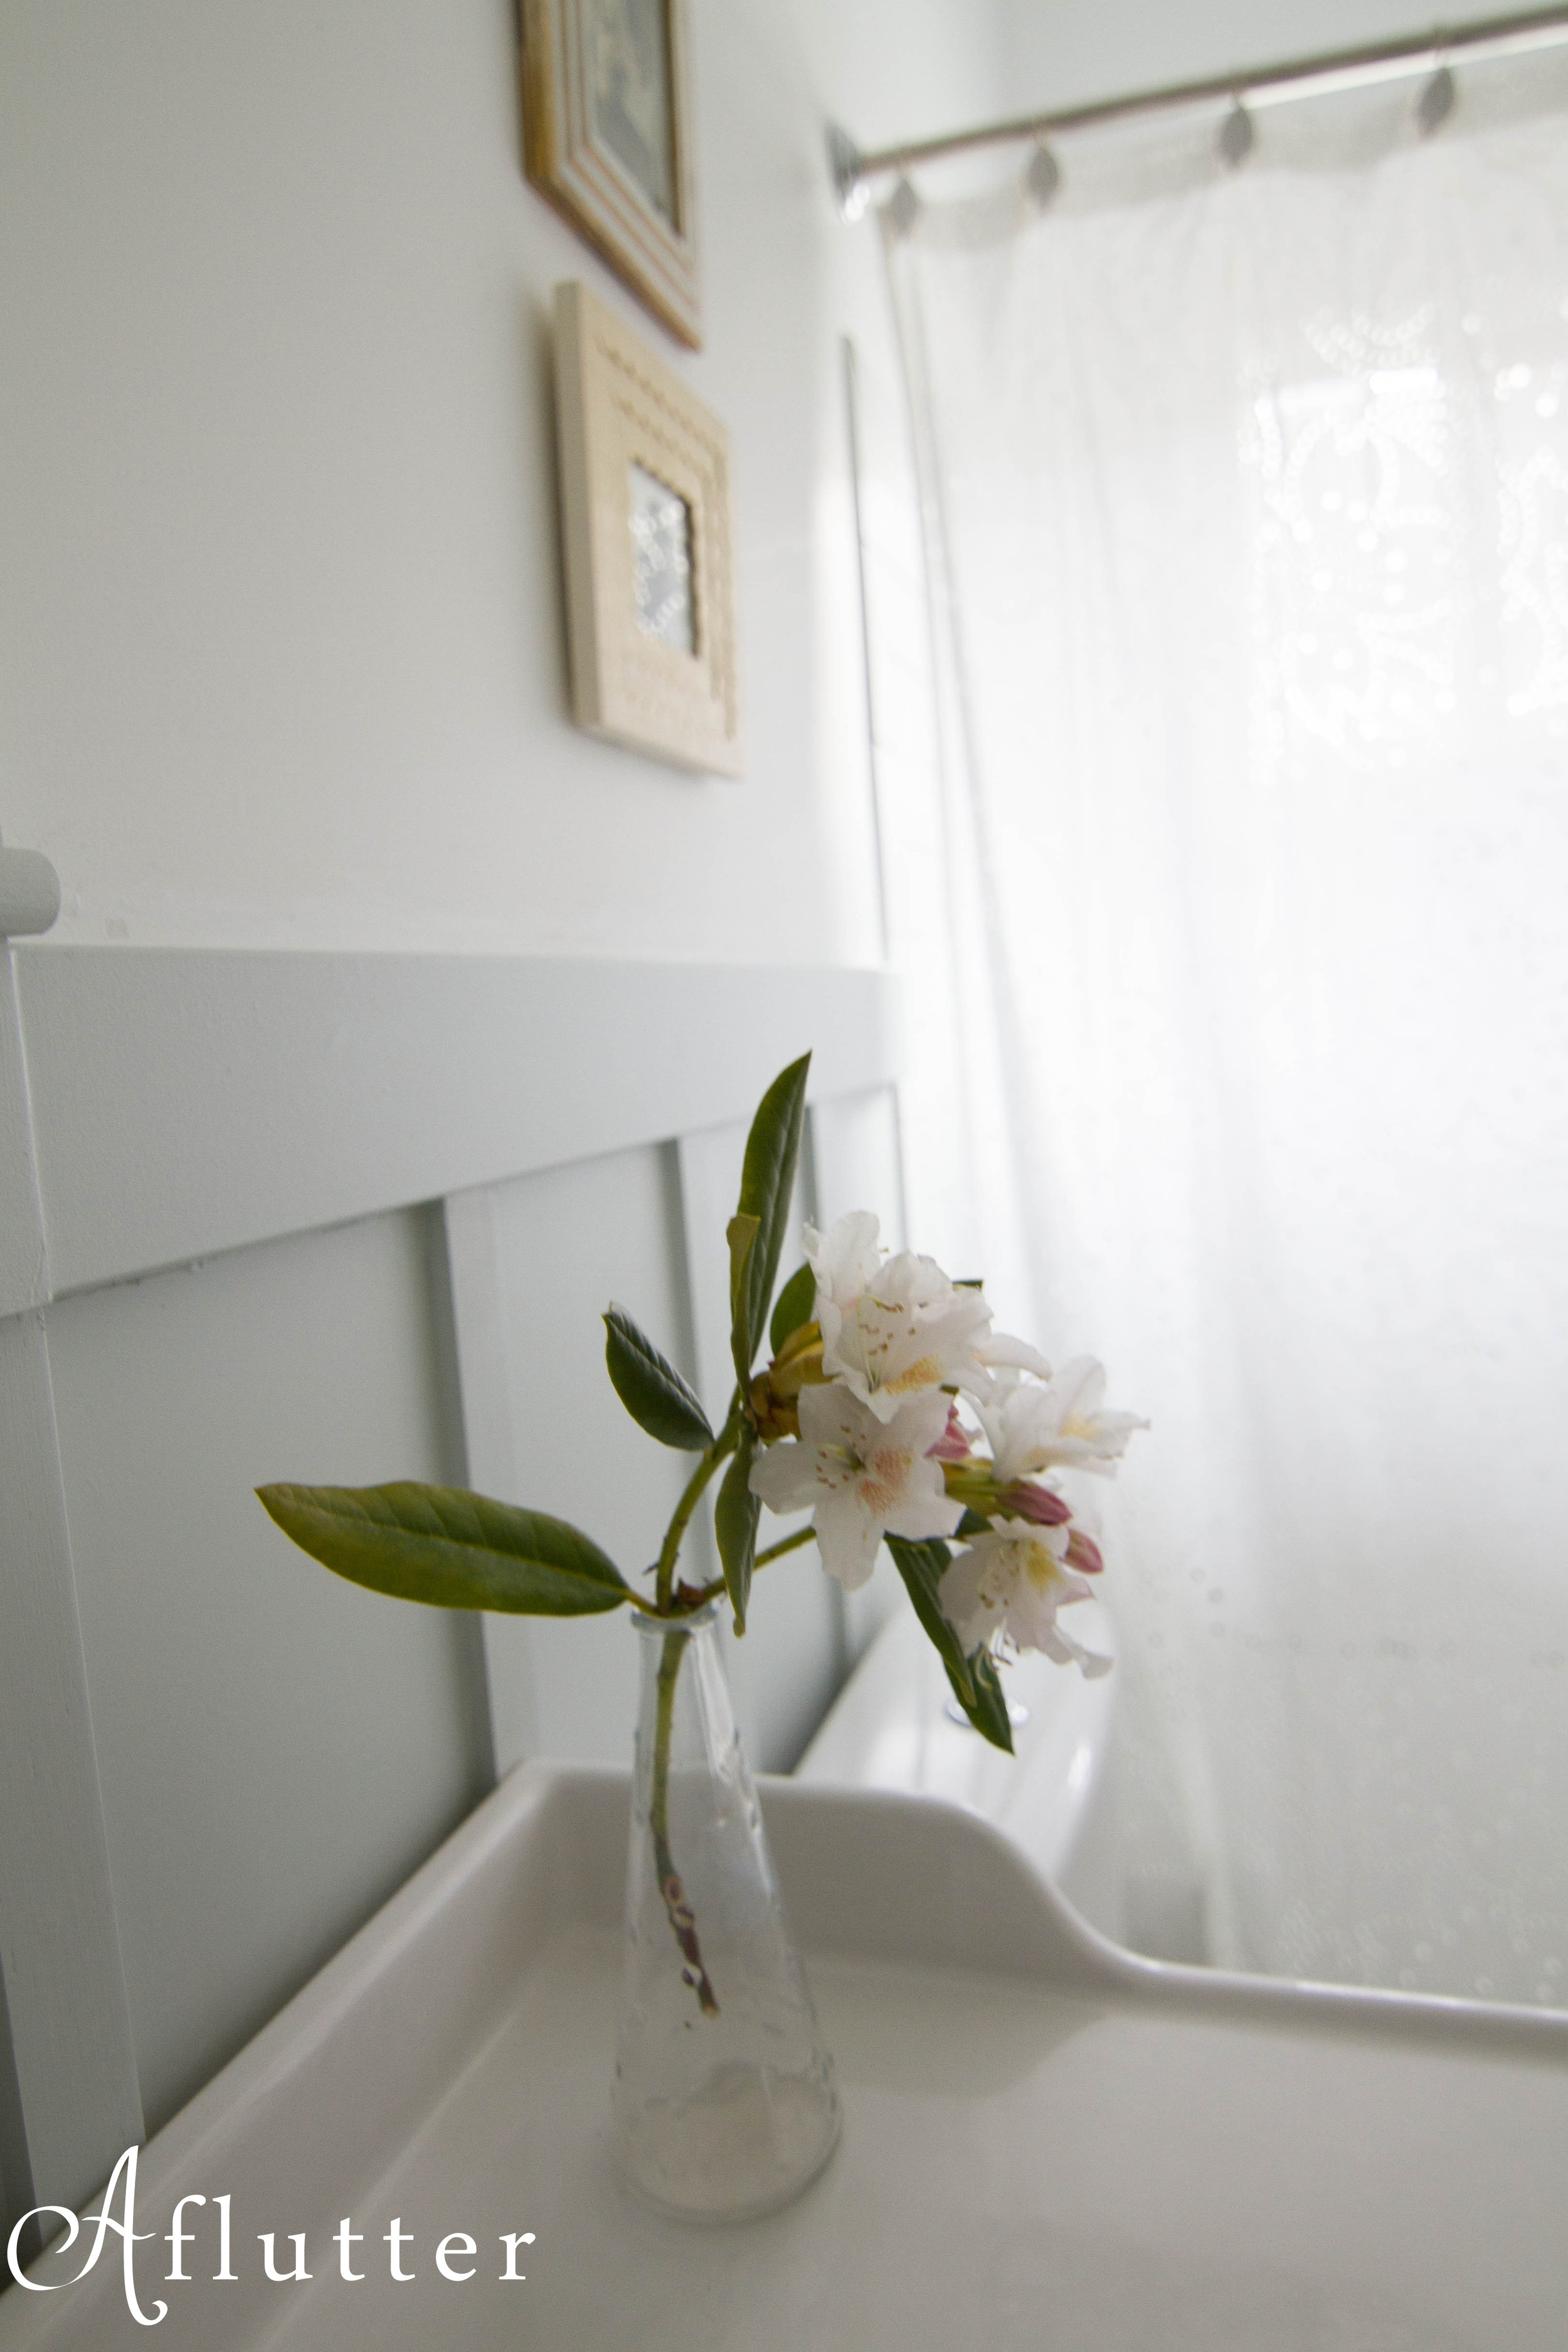 Bath-Remodel-5-of-11.jpg